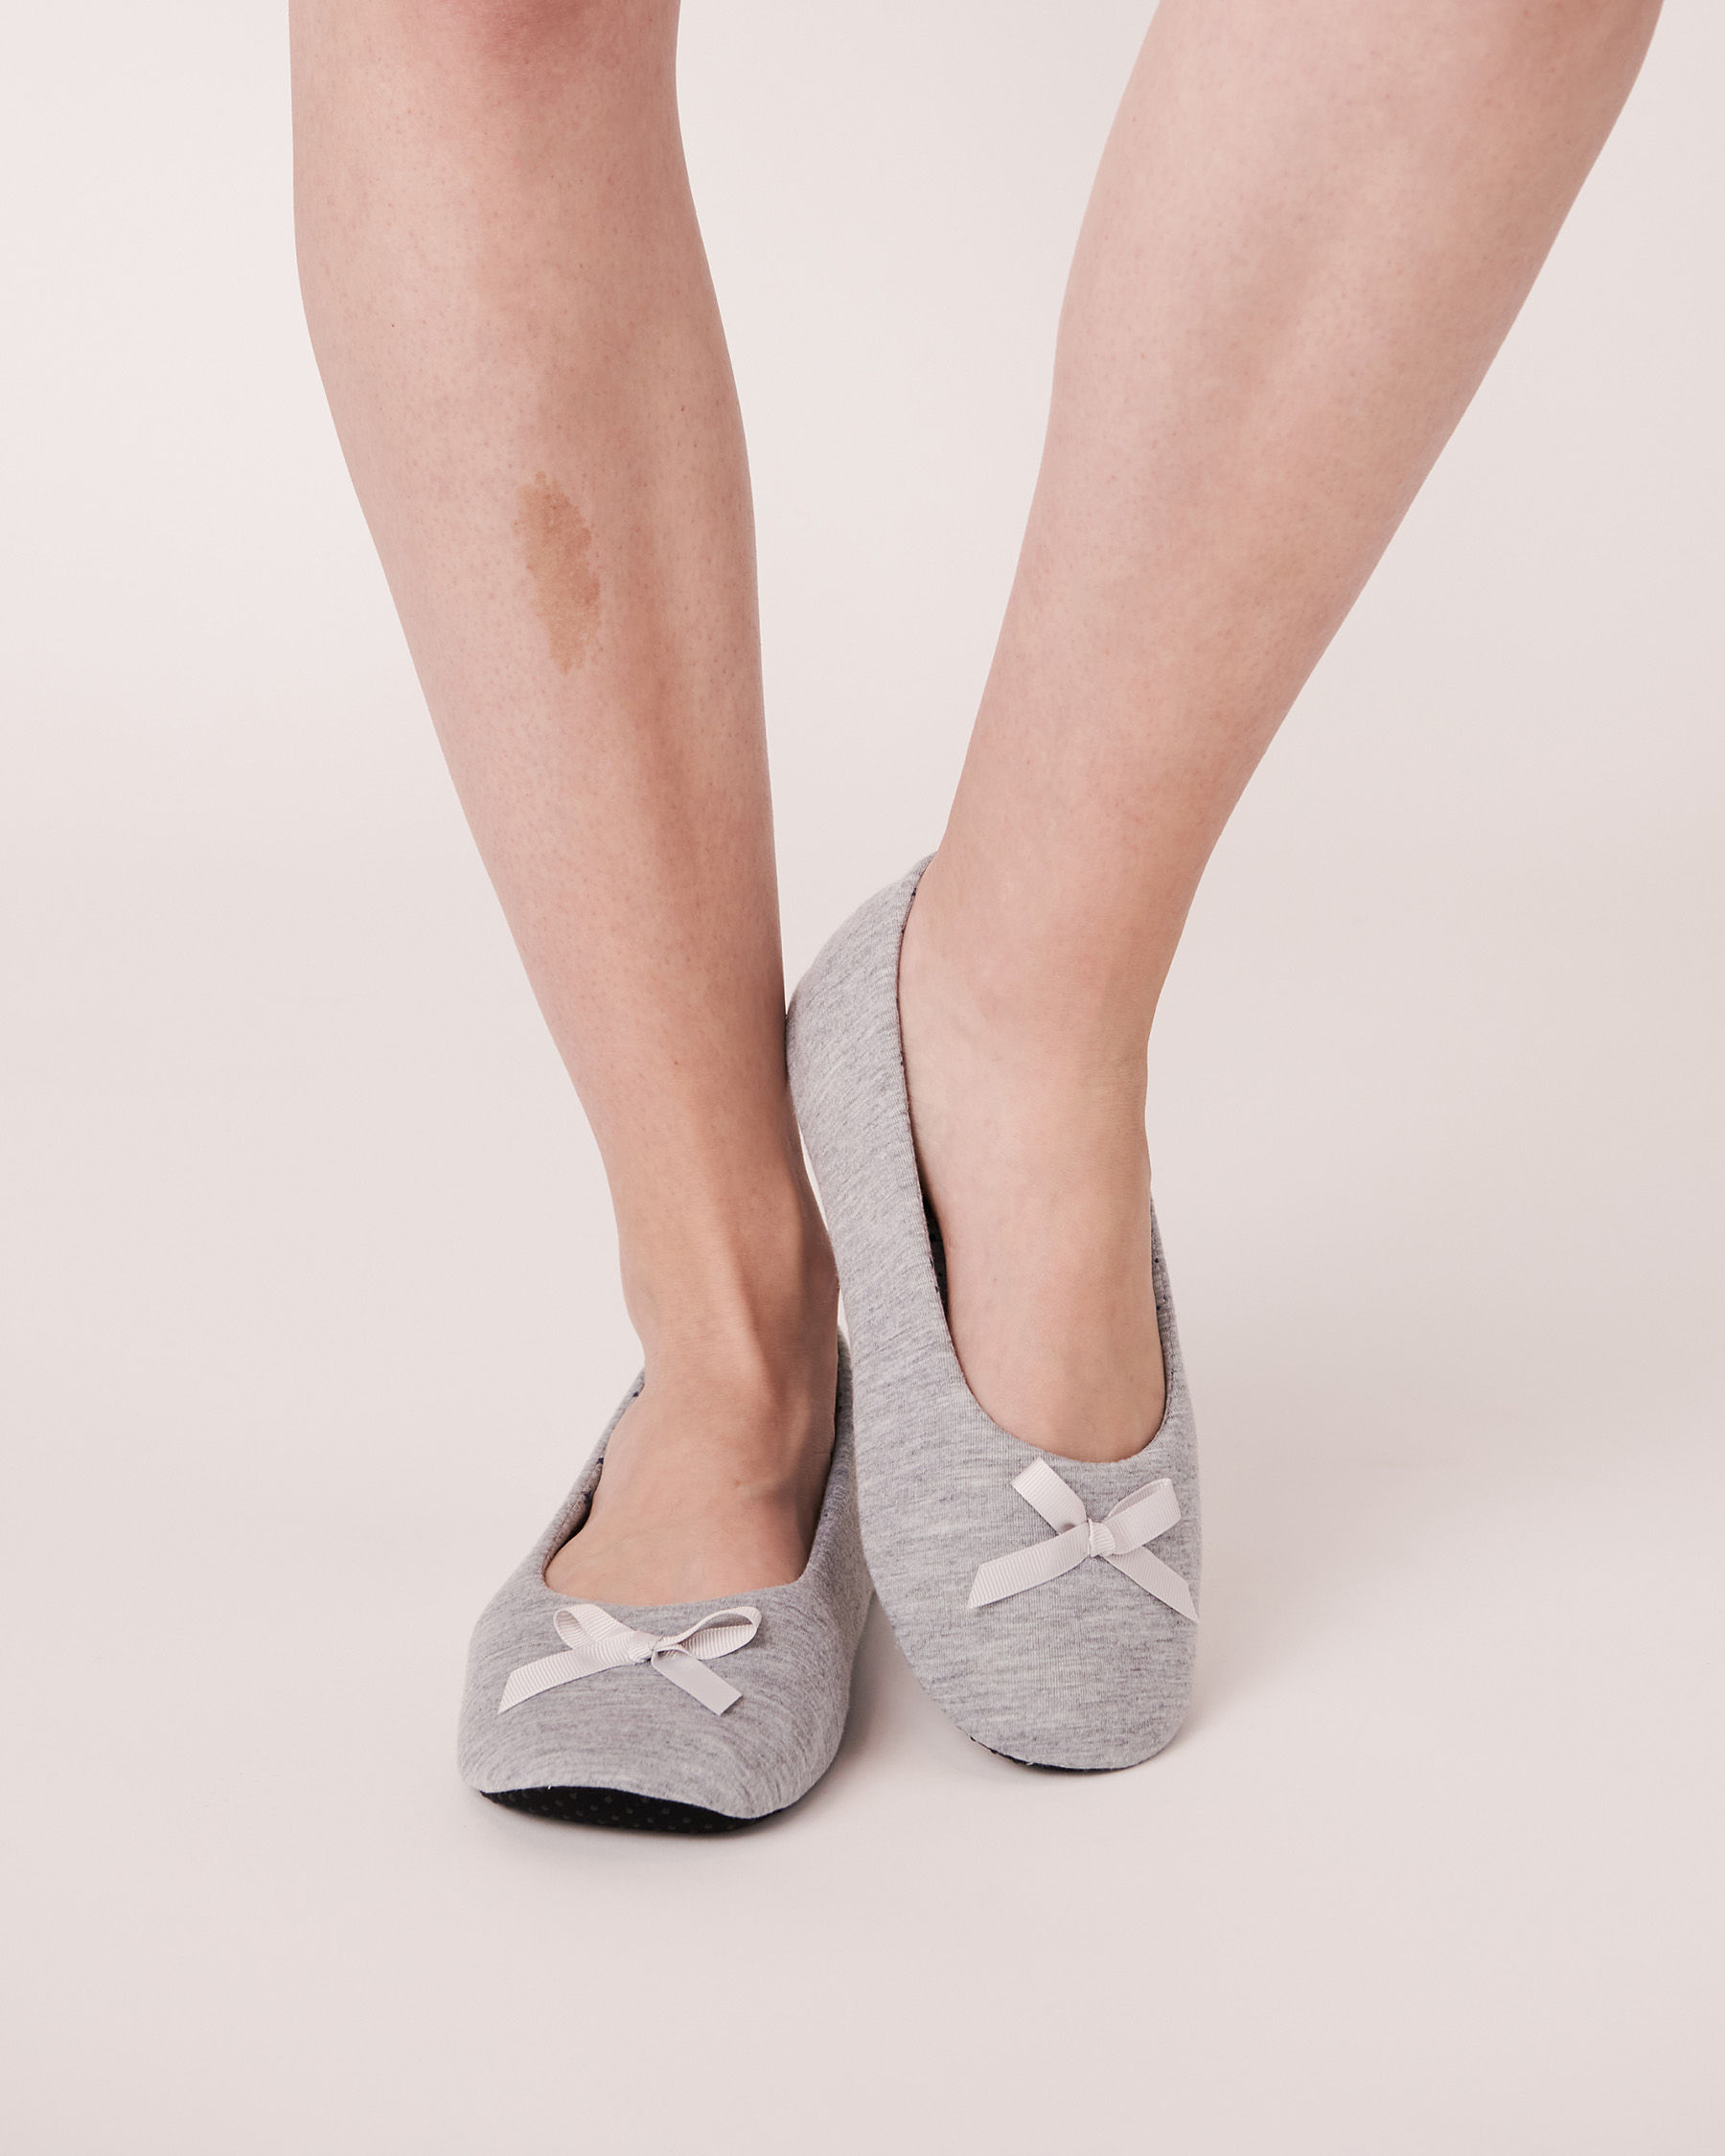 LA VIE EN ROSE Ballerina Slippers Grey 894-551-0-11 - View1